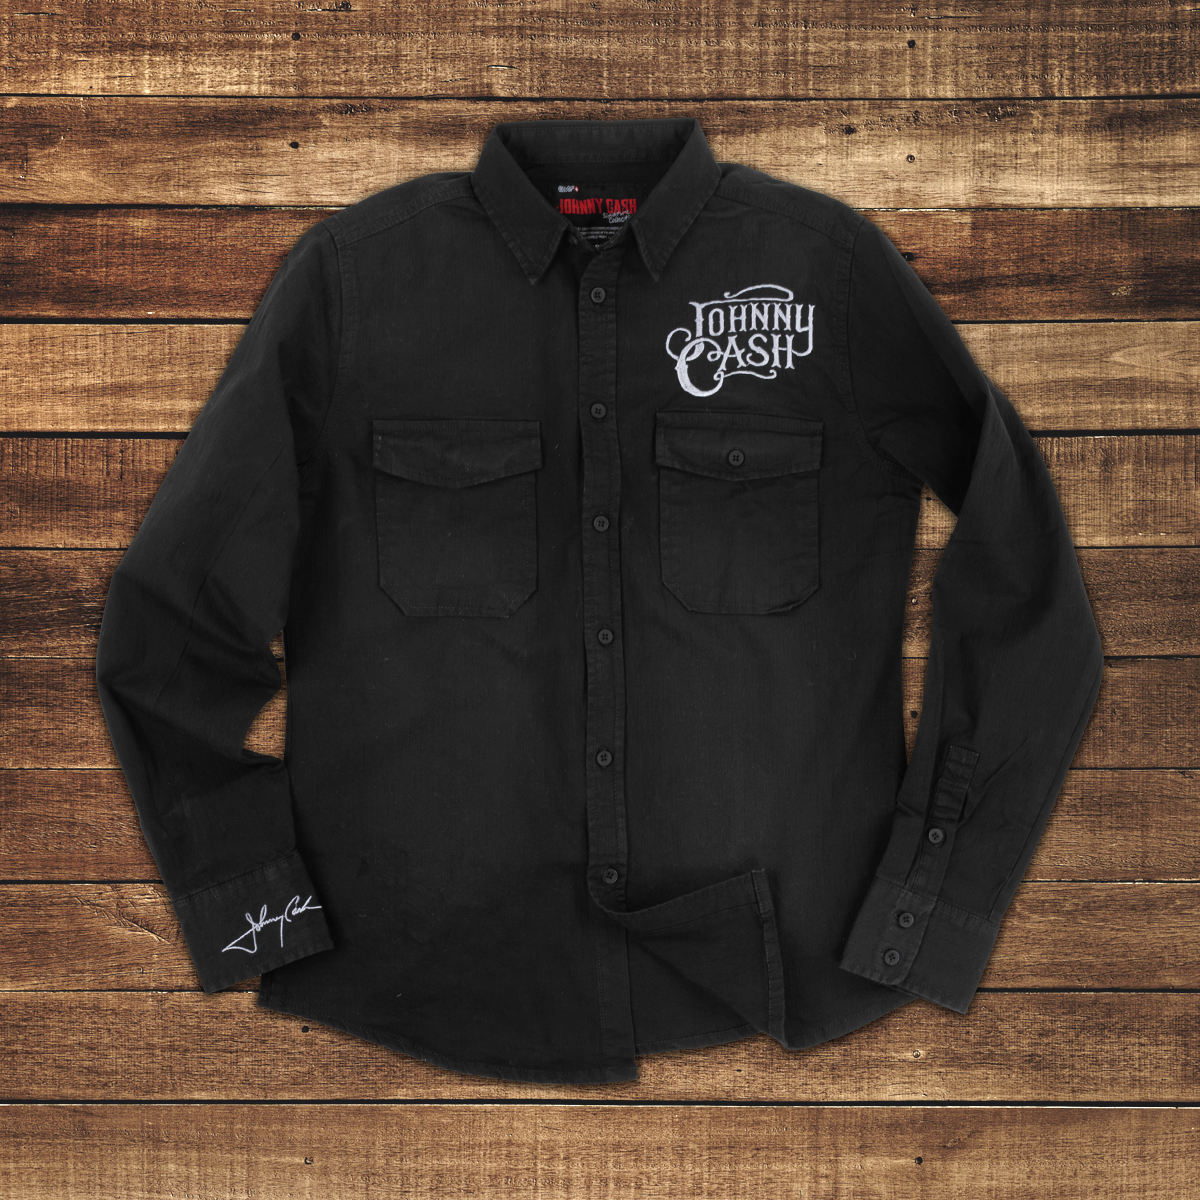 EMP JC MIB Black Button Up Collared Shirt